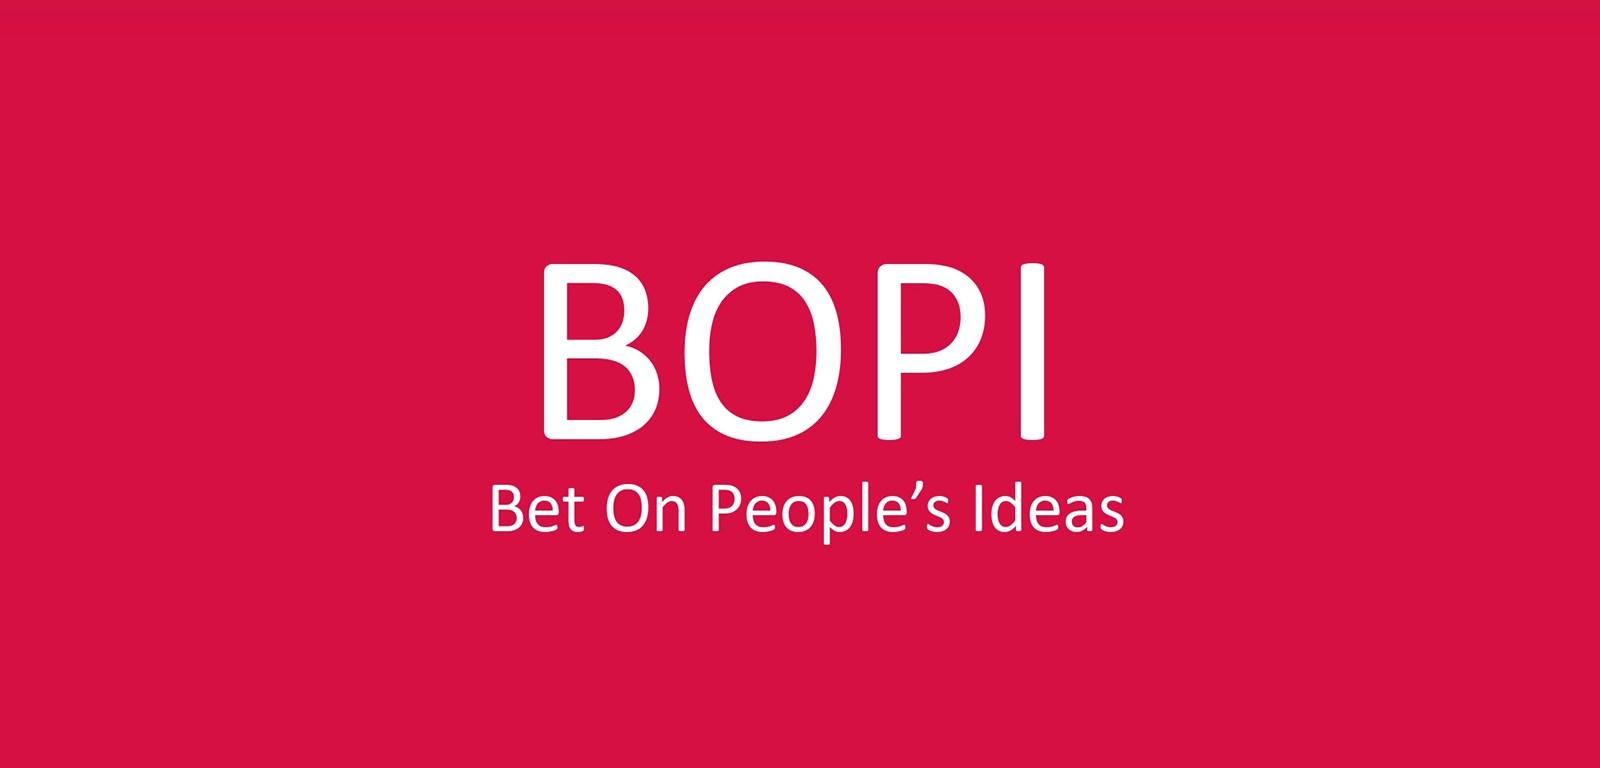 BOPI - bet on people ideas